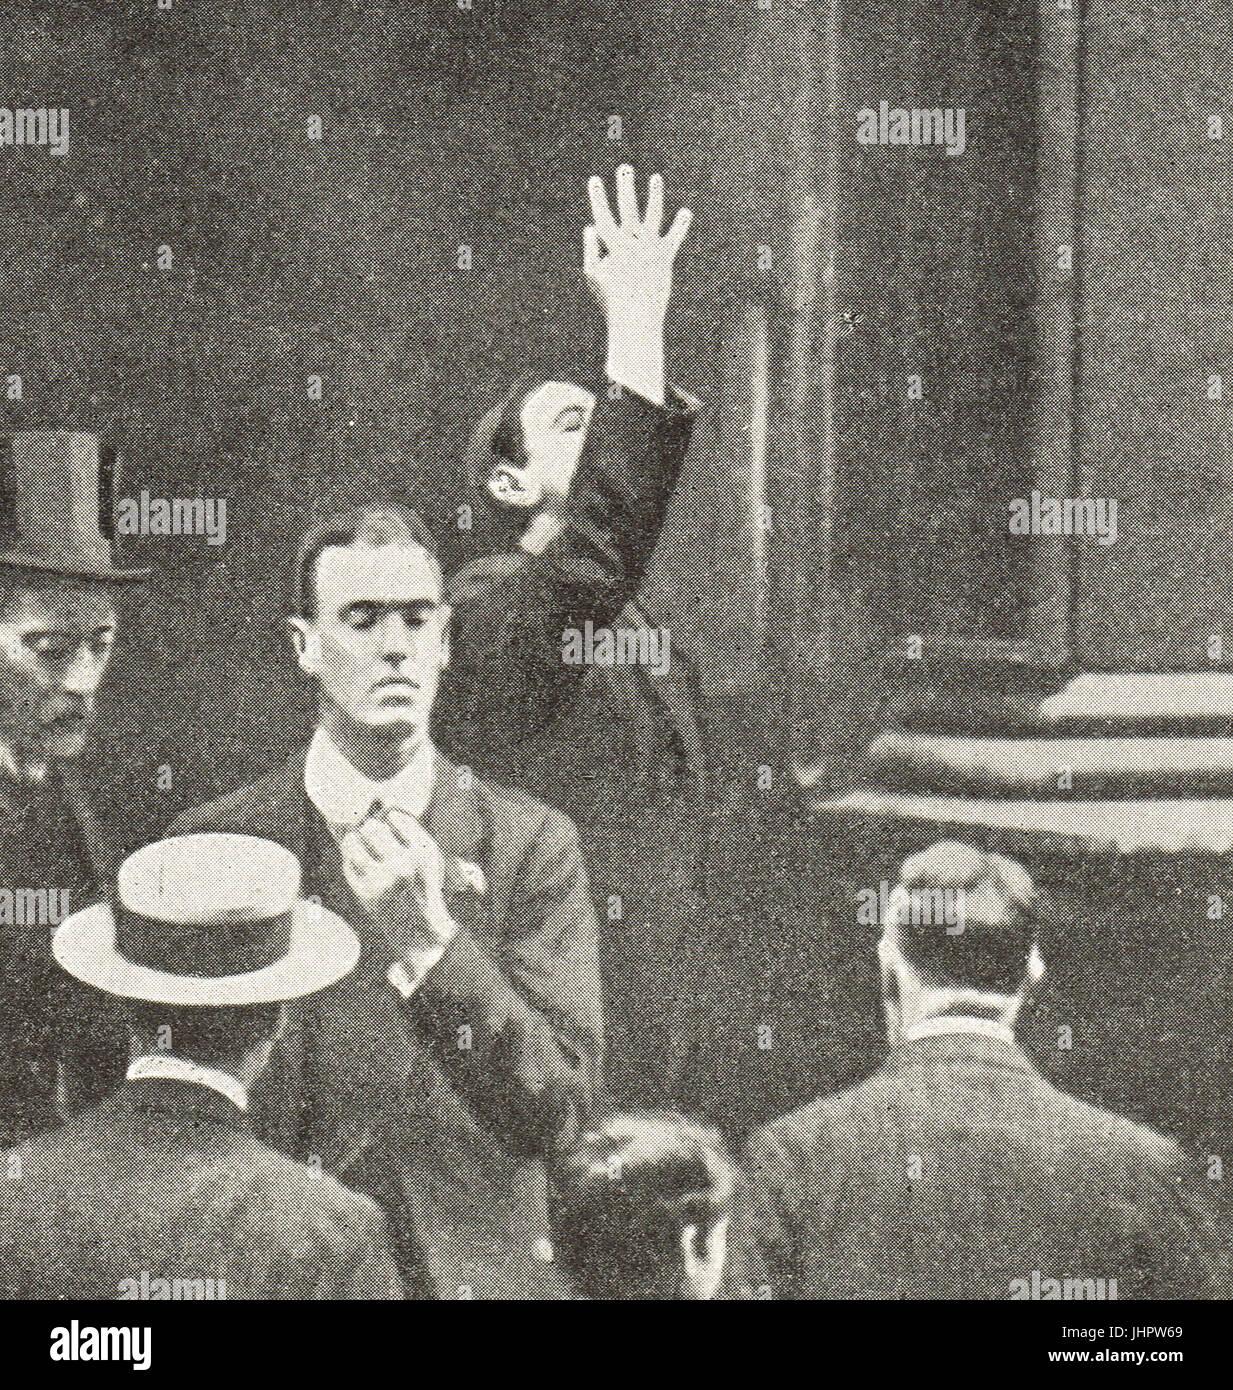 Financial crisis, England, July 1914 - Stock Image